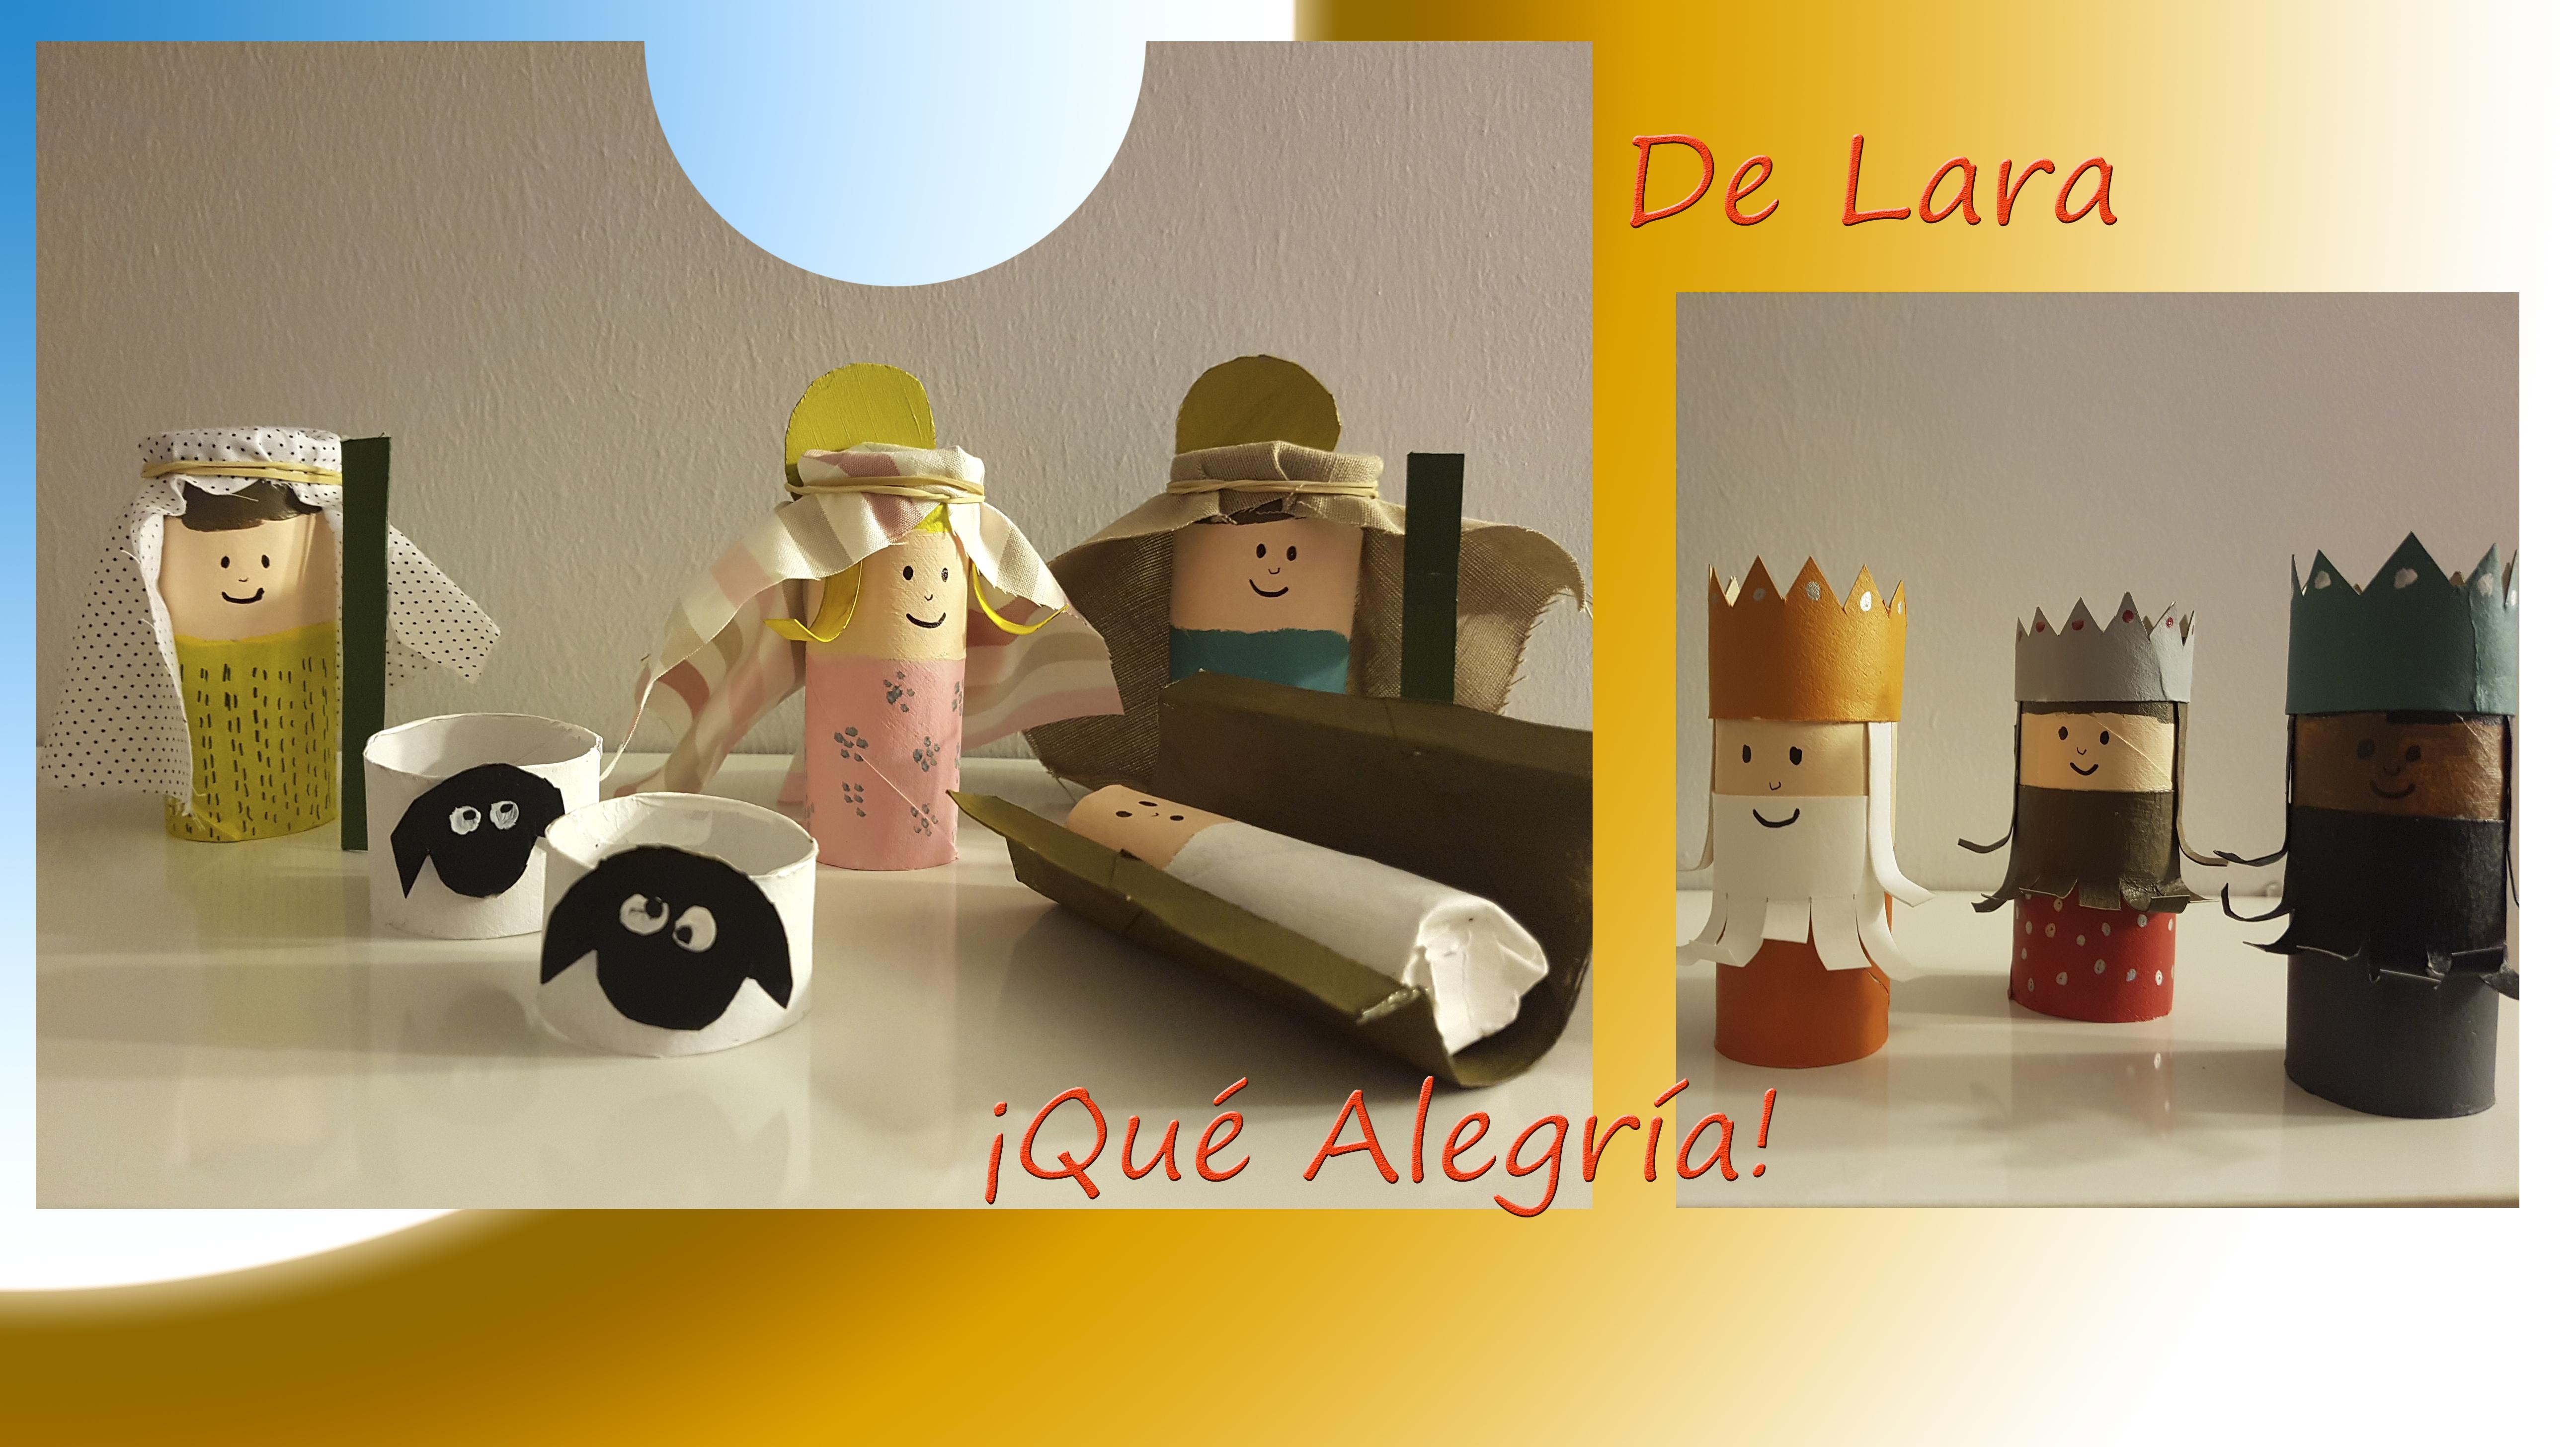 De Lara